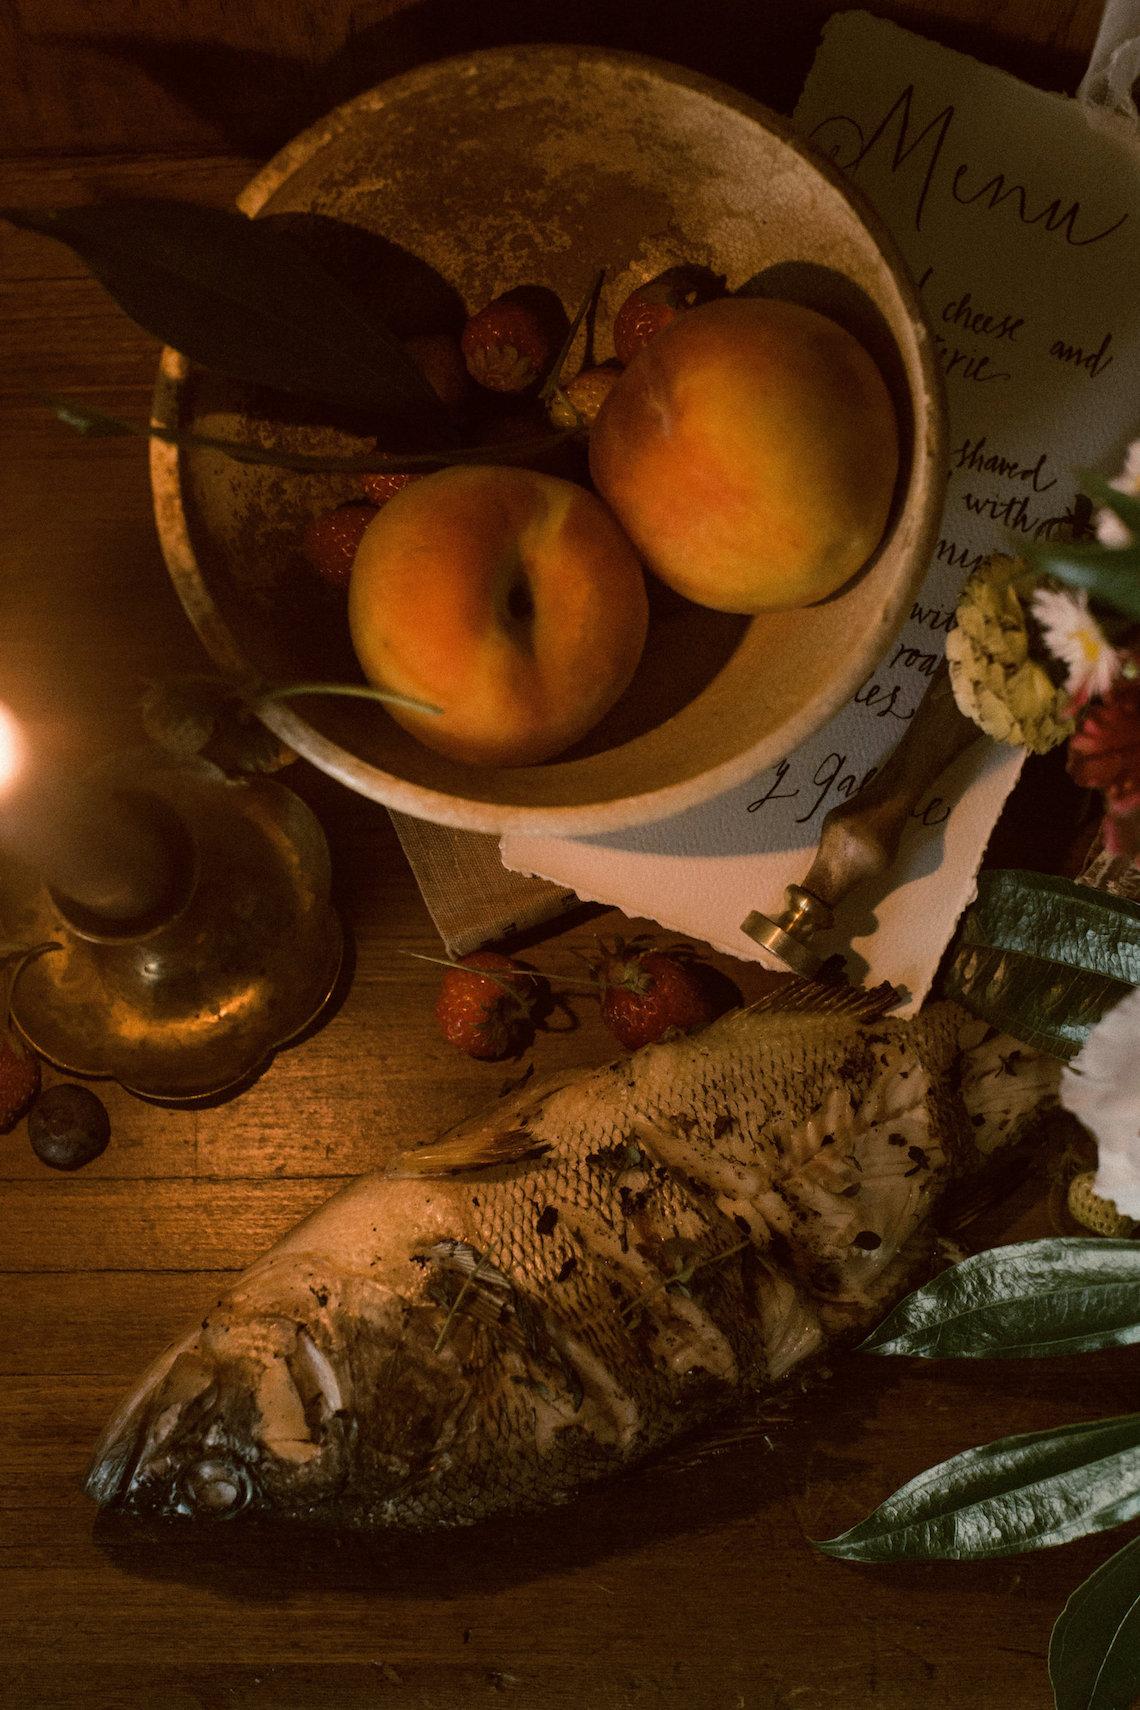 Romantic Candlelit Wedding Inspiration Full of Drama | Megan Wynn 30